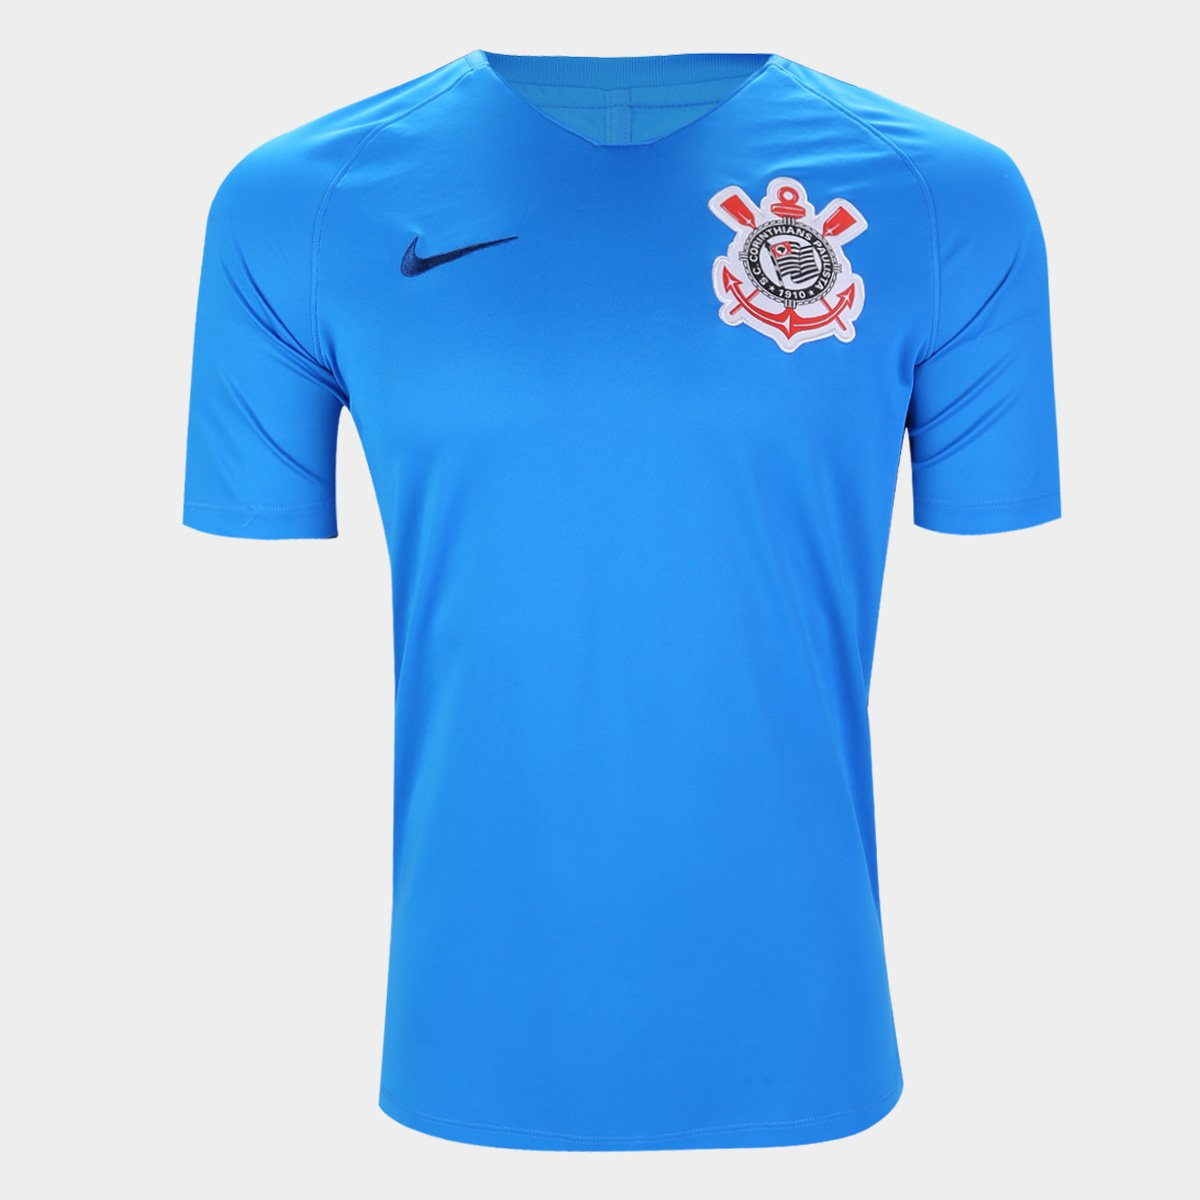 8572f737ee516 Camisa Corinthians Treino 19 20 Nike Masculina - Azul Royal - Compre ...